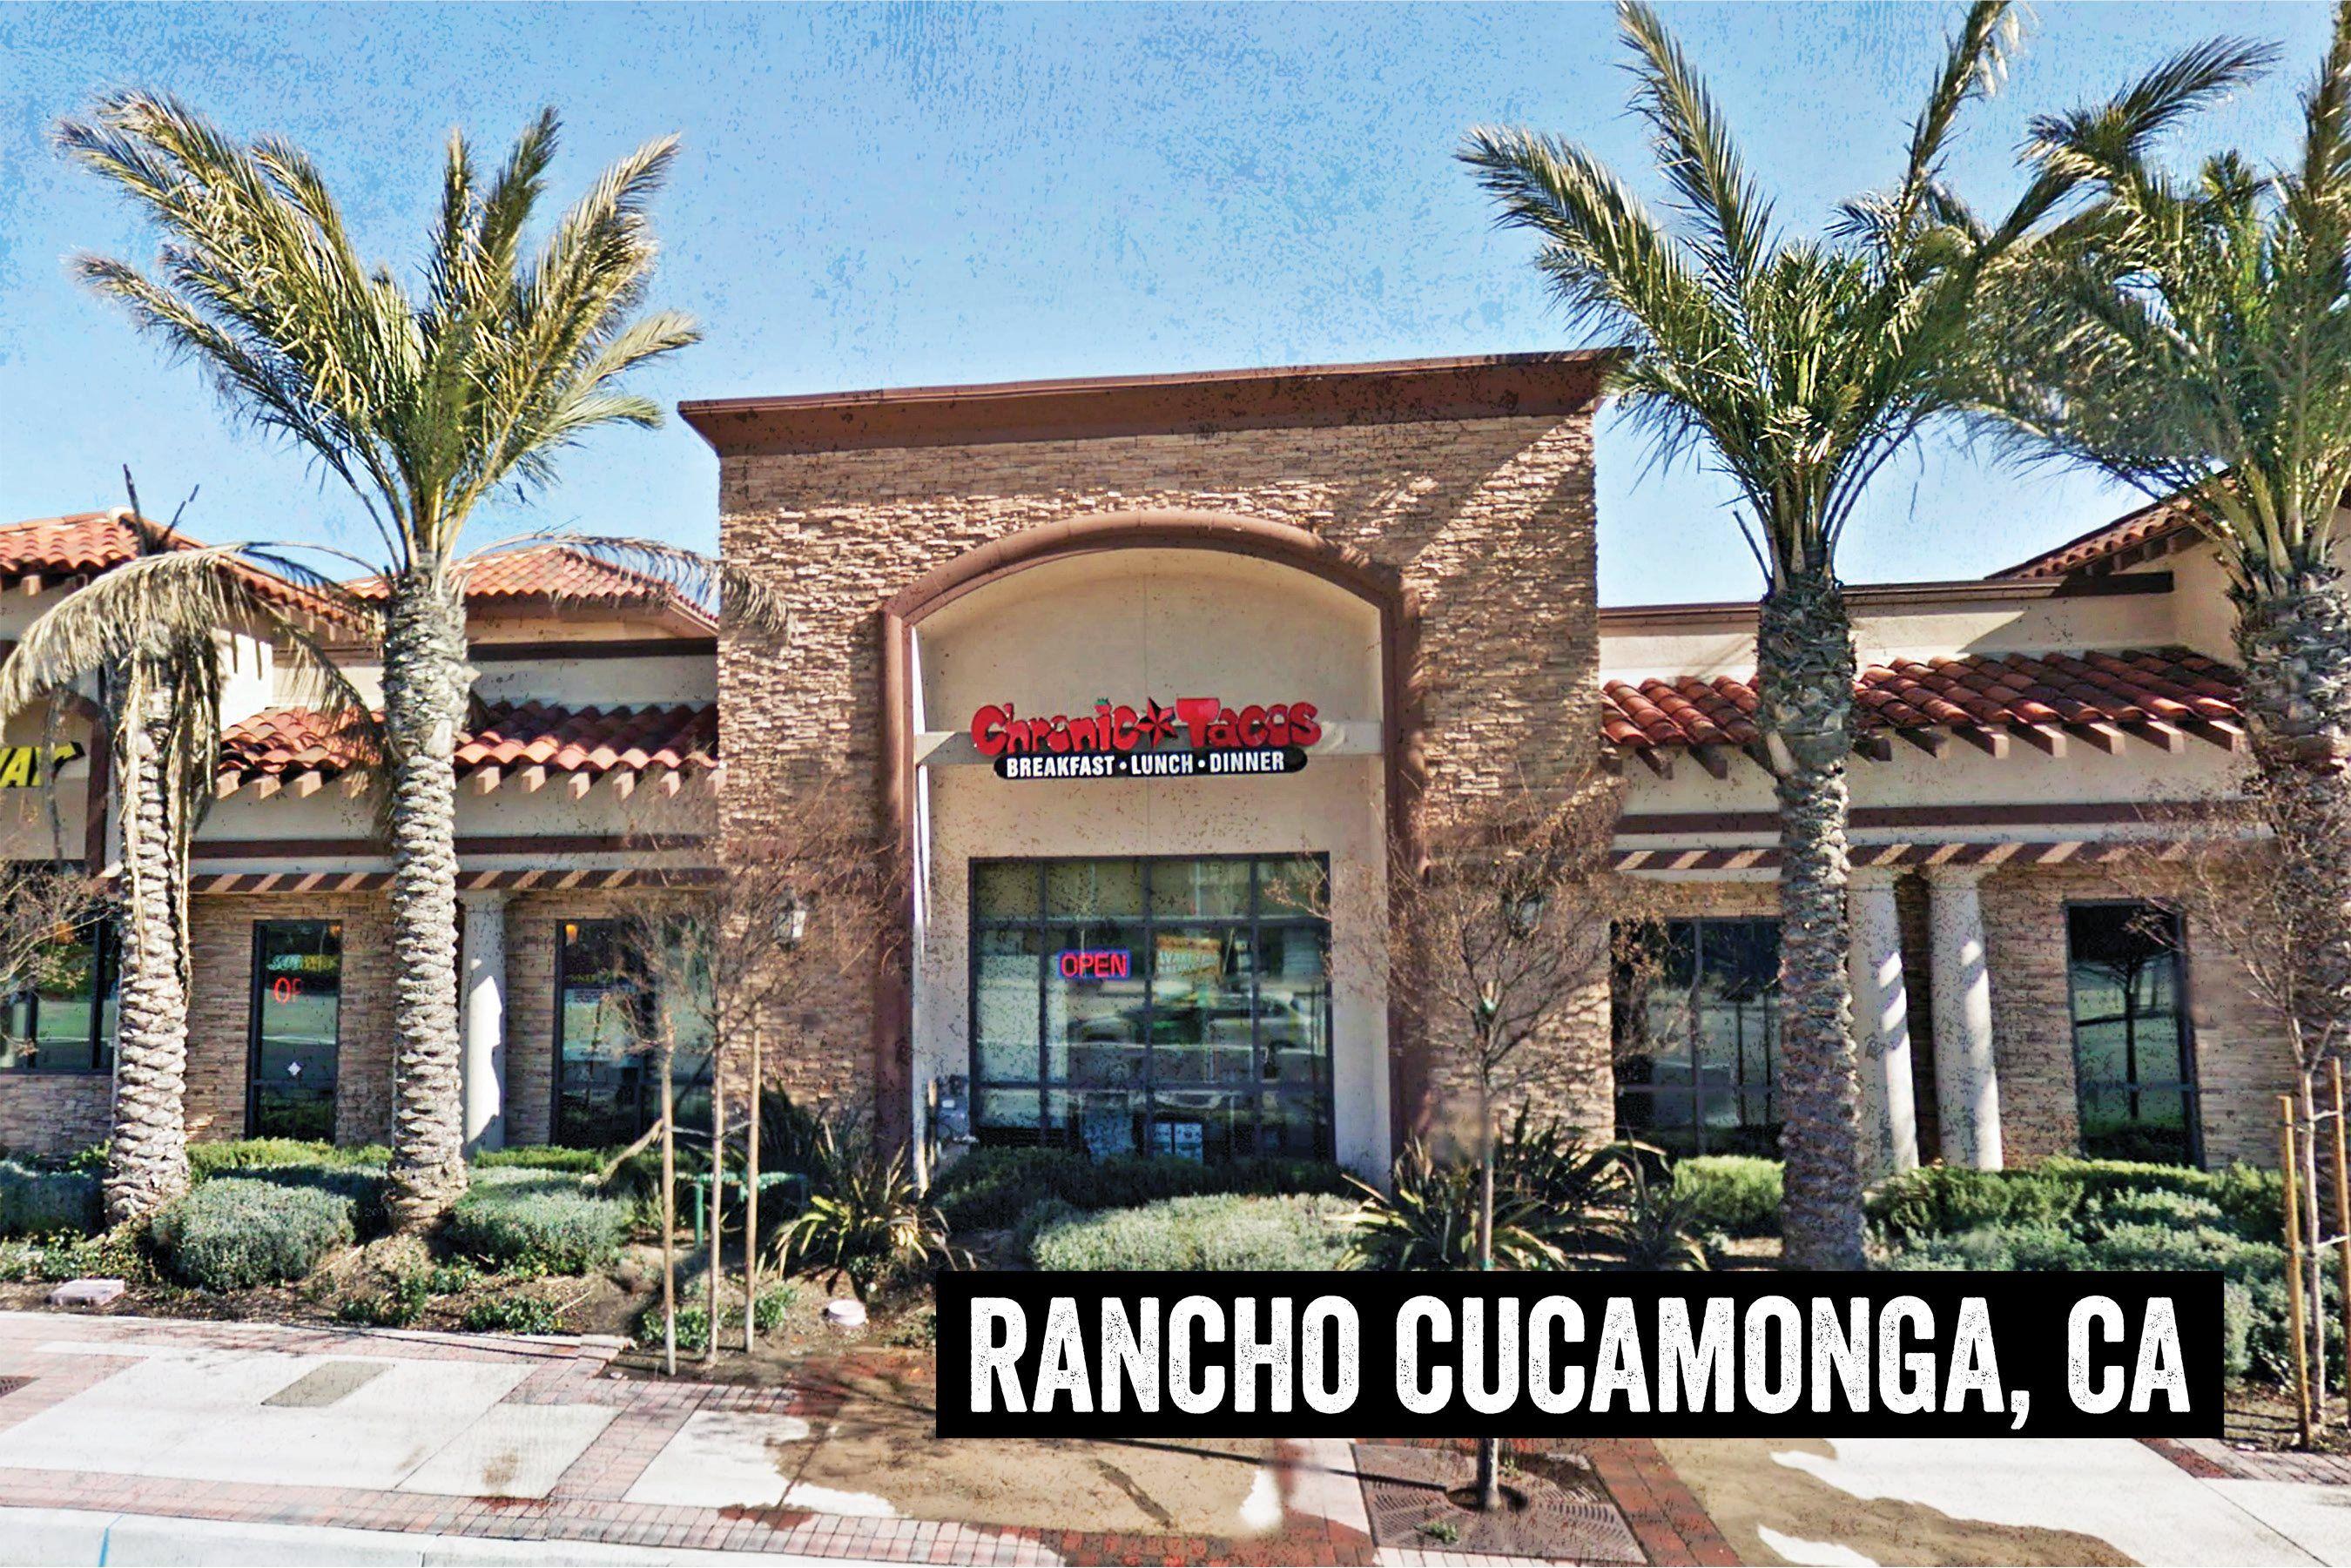 Chronic Tacos Rancho Cucamonga 11920 Foothill Blvd Rancho Cucamonga Ca Location Hours